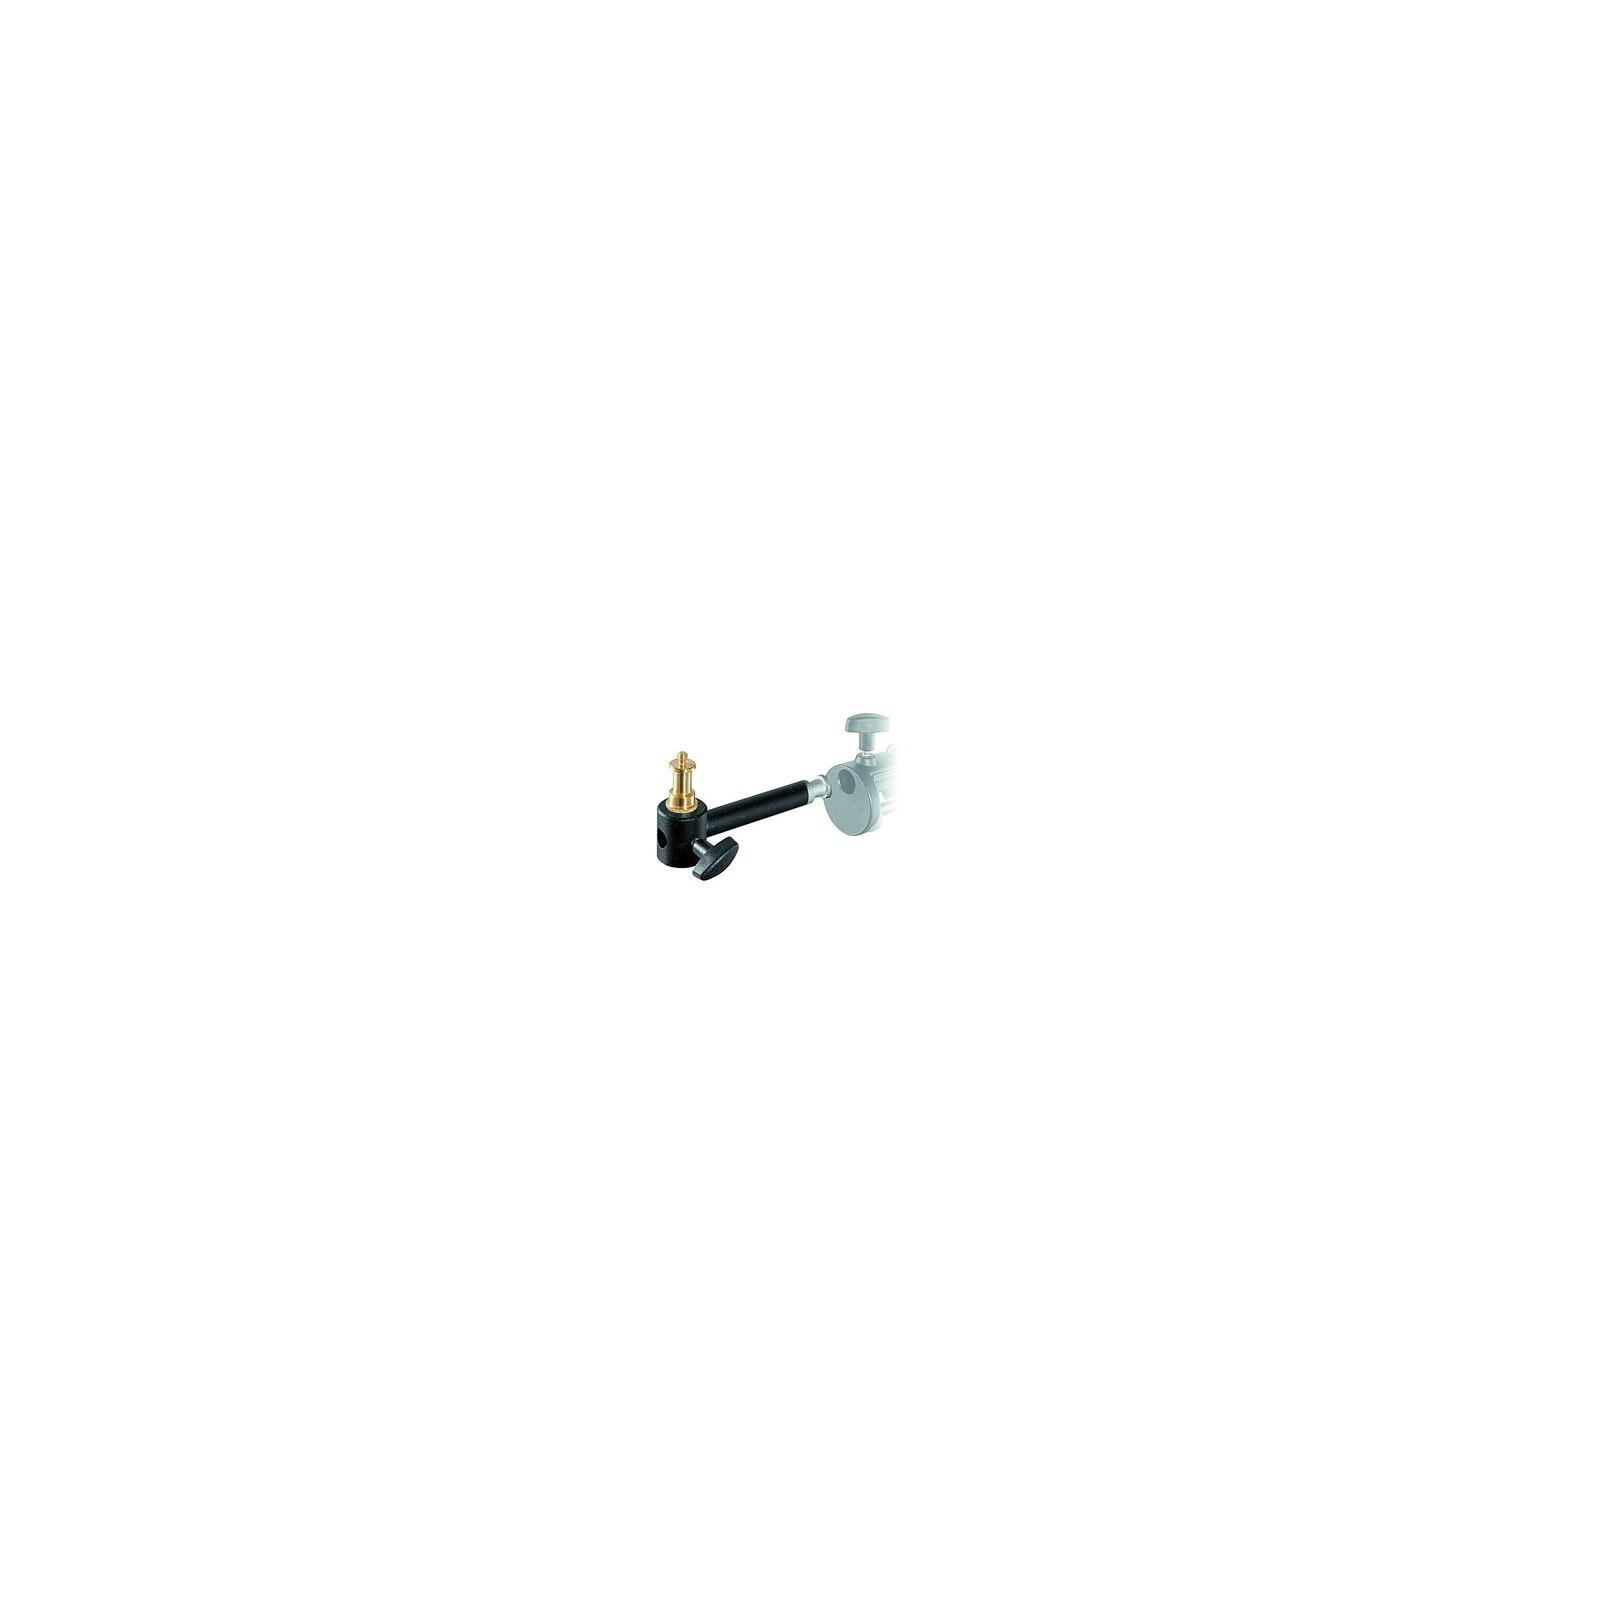 Manfrotto 203 Auslegearm f. Mini Clamp